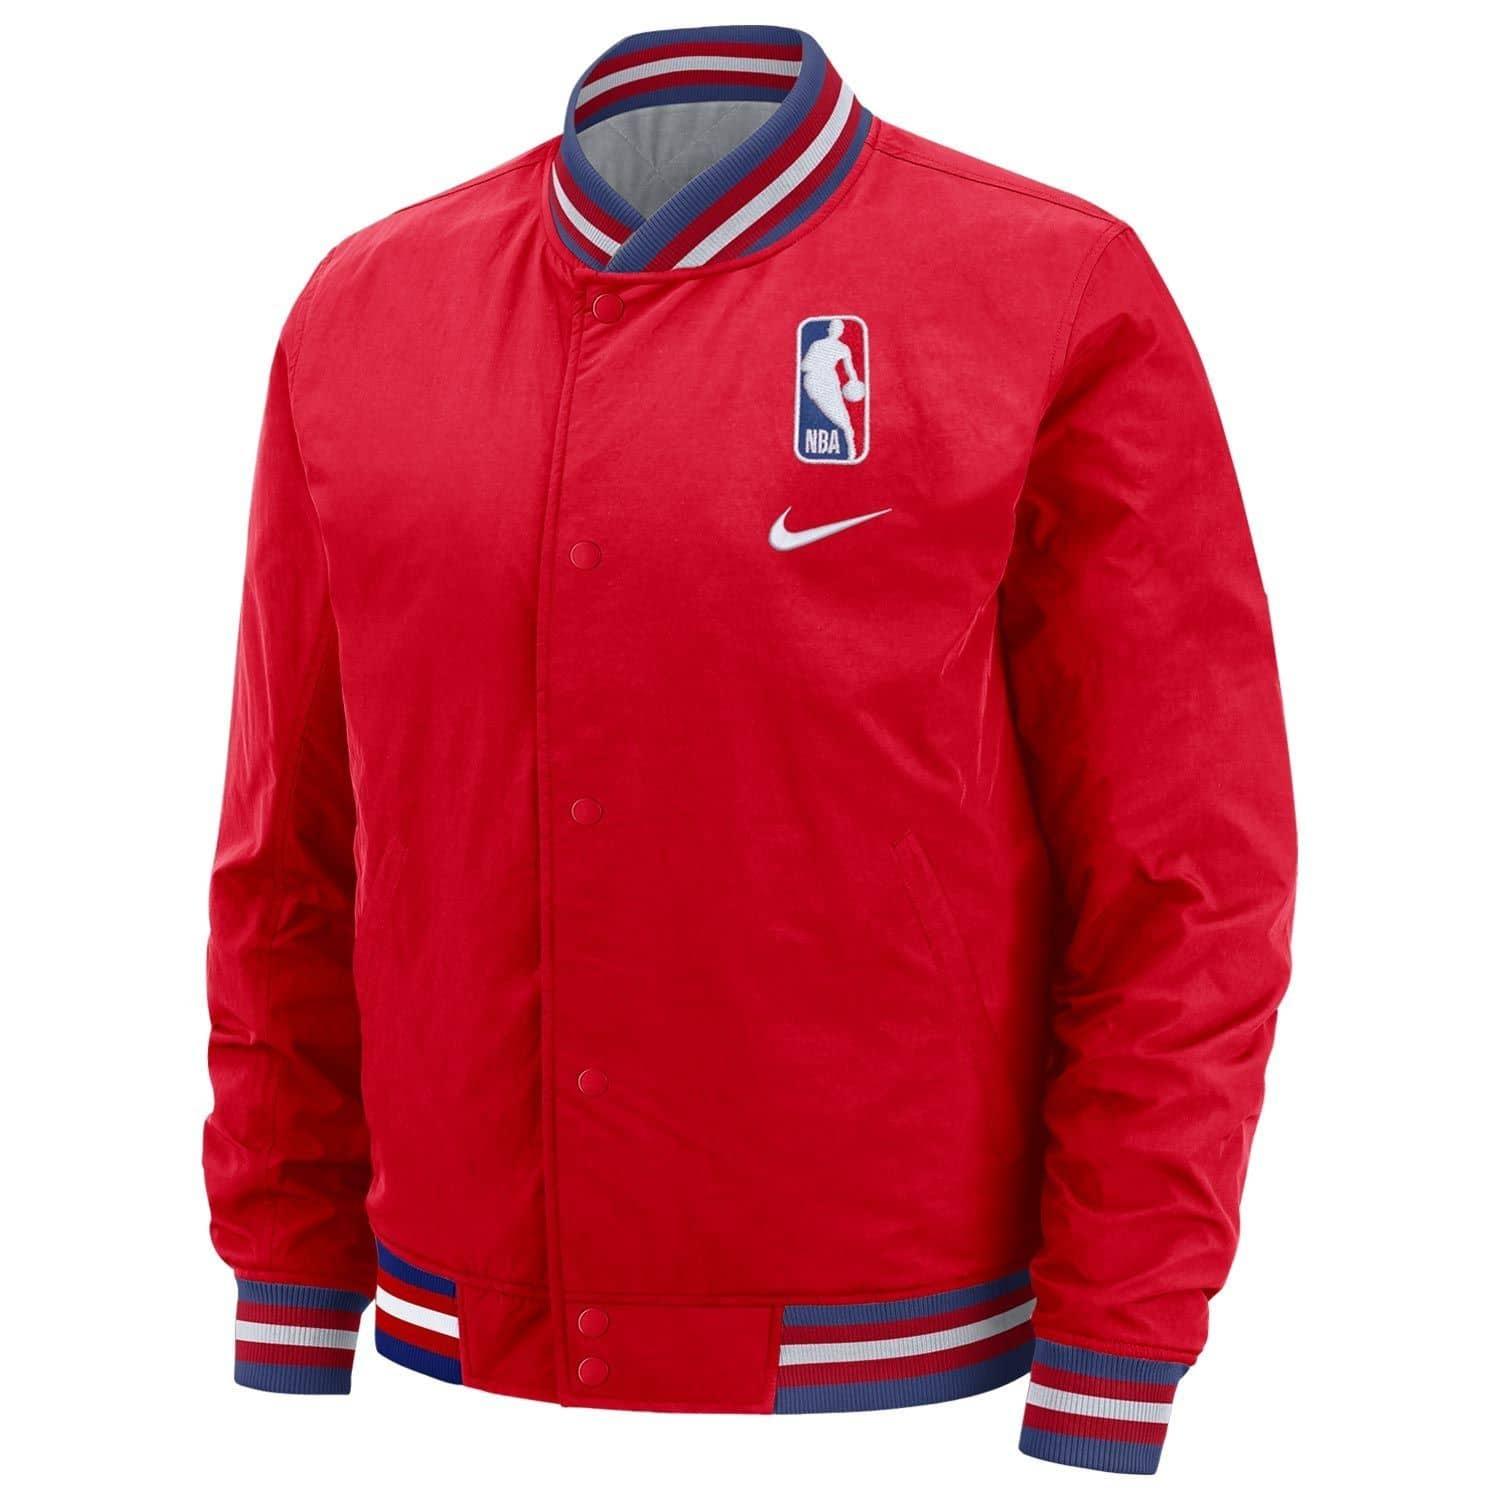 NBA Logo College Style Basketball Jacke Rot